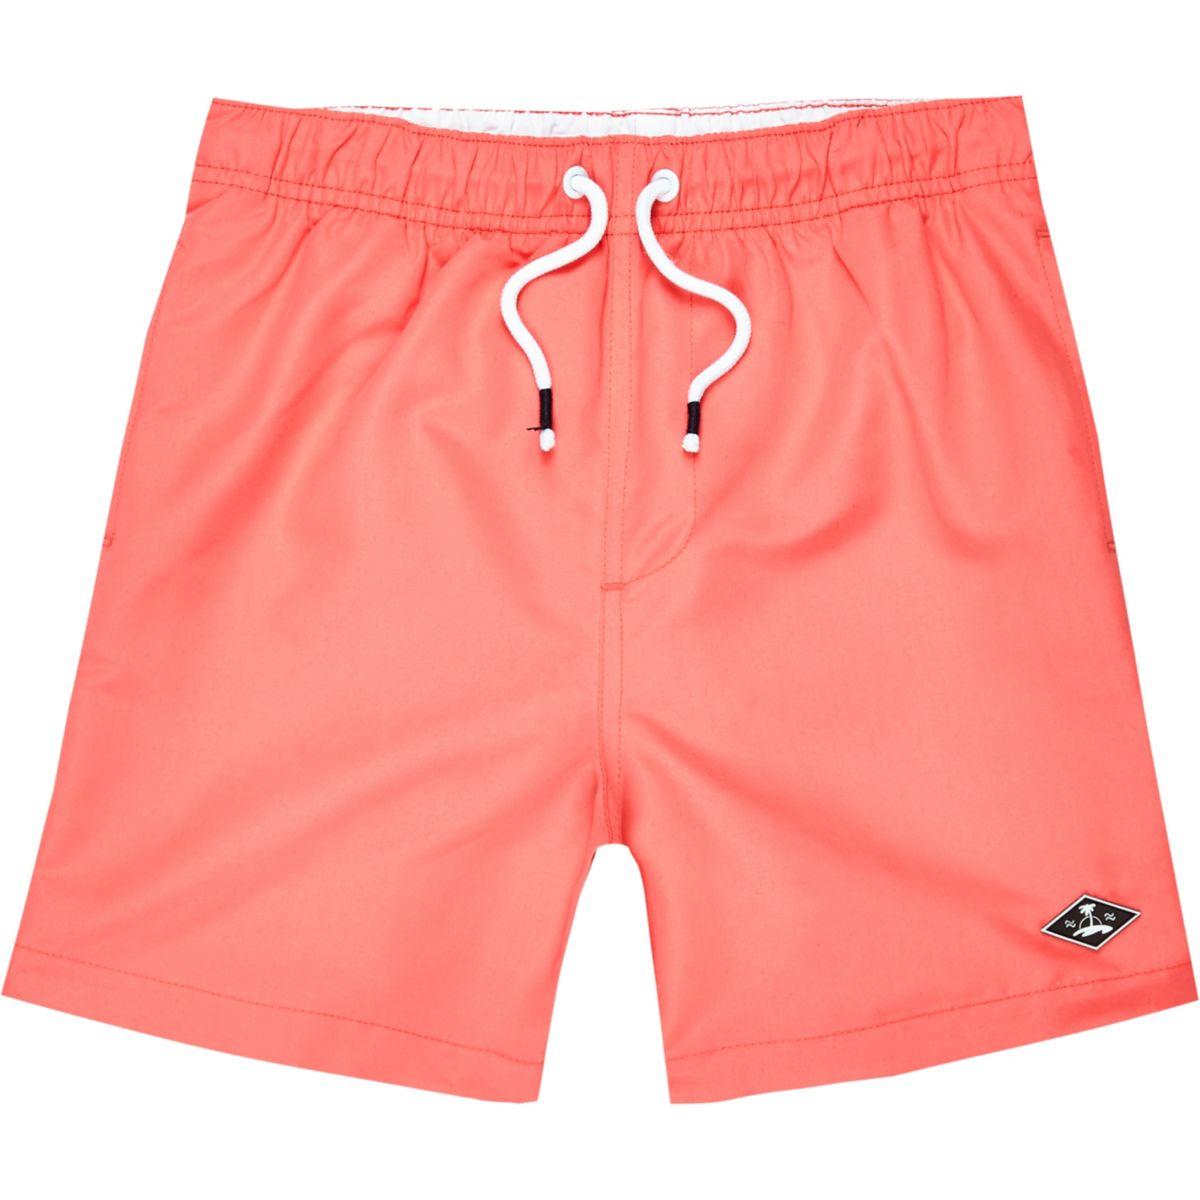 Boys coral swim trunks